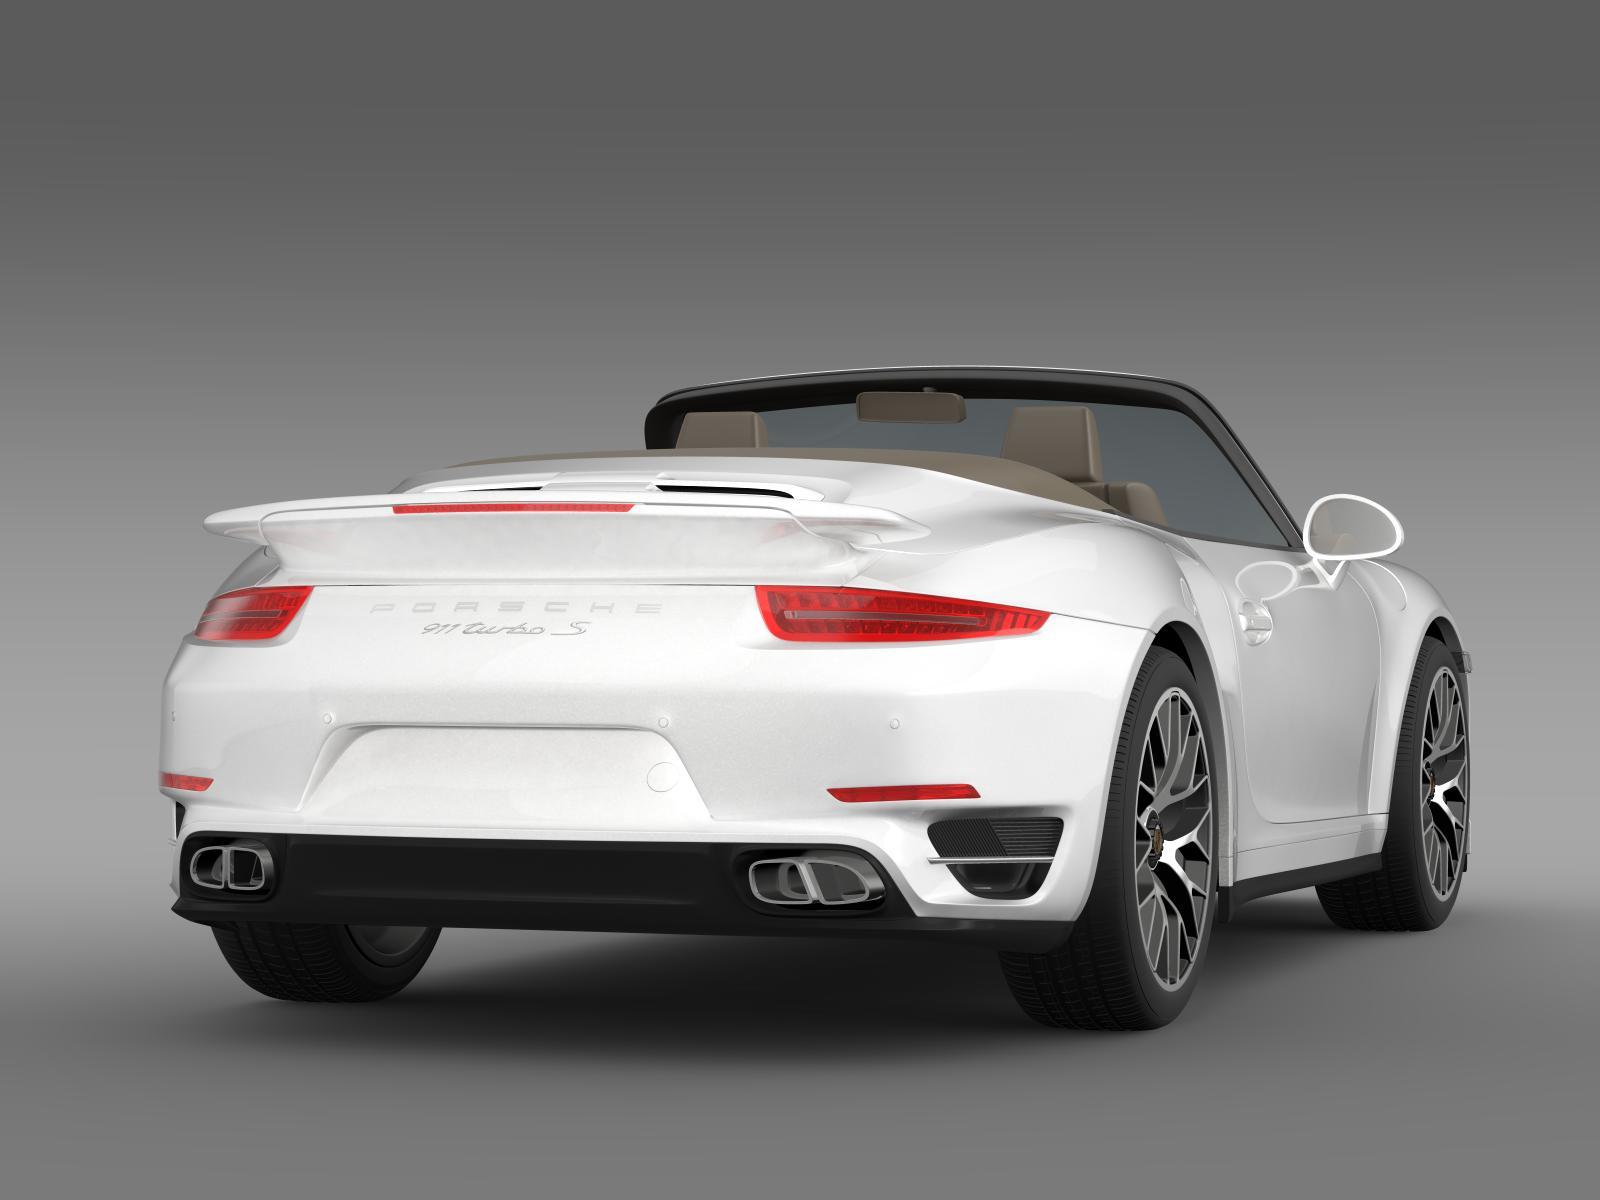 porsche 911 turbo s cabrio 2014 3d model. Black Bedroom Furniture Sets. Home Design Ideas